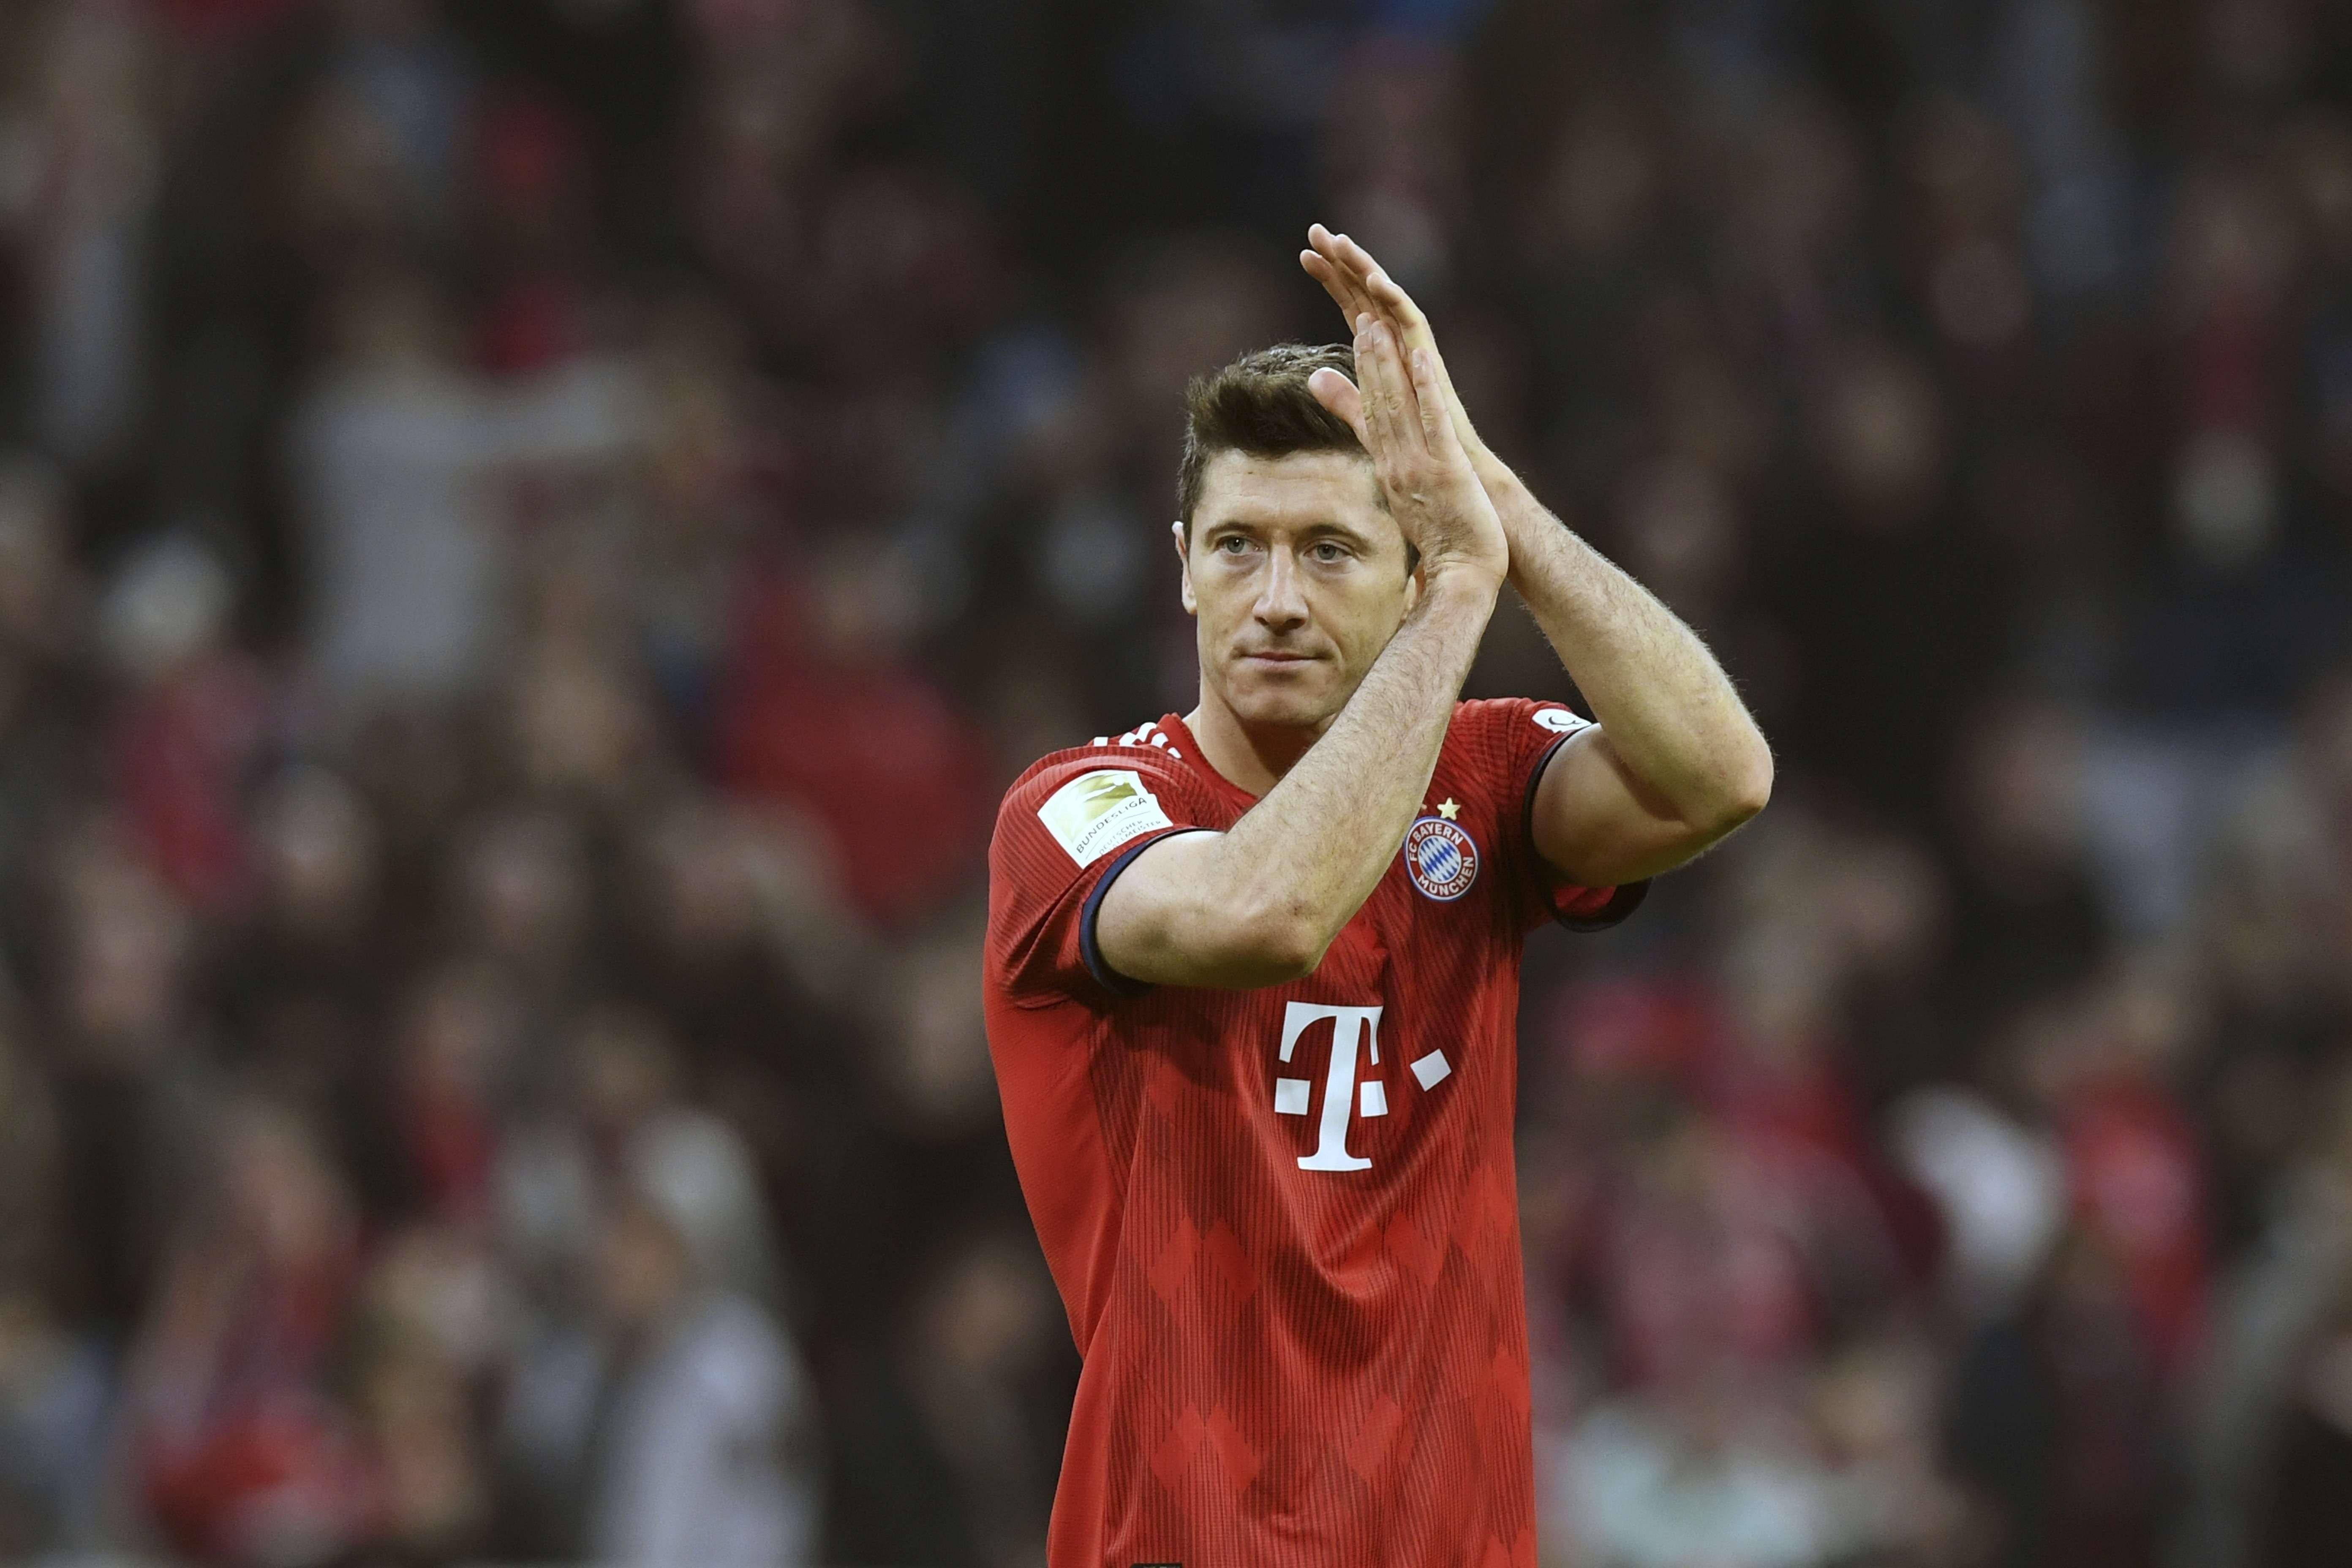 Riña de jugadores de Bayern no tendrá consecuencias